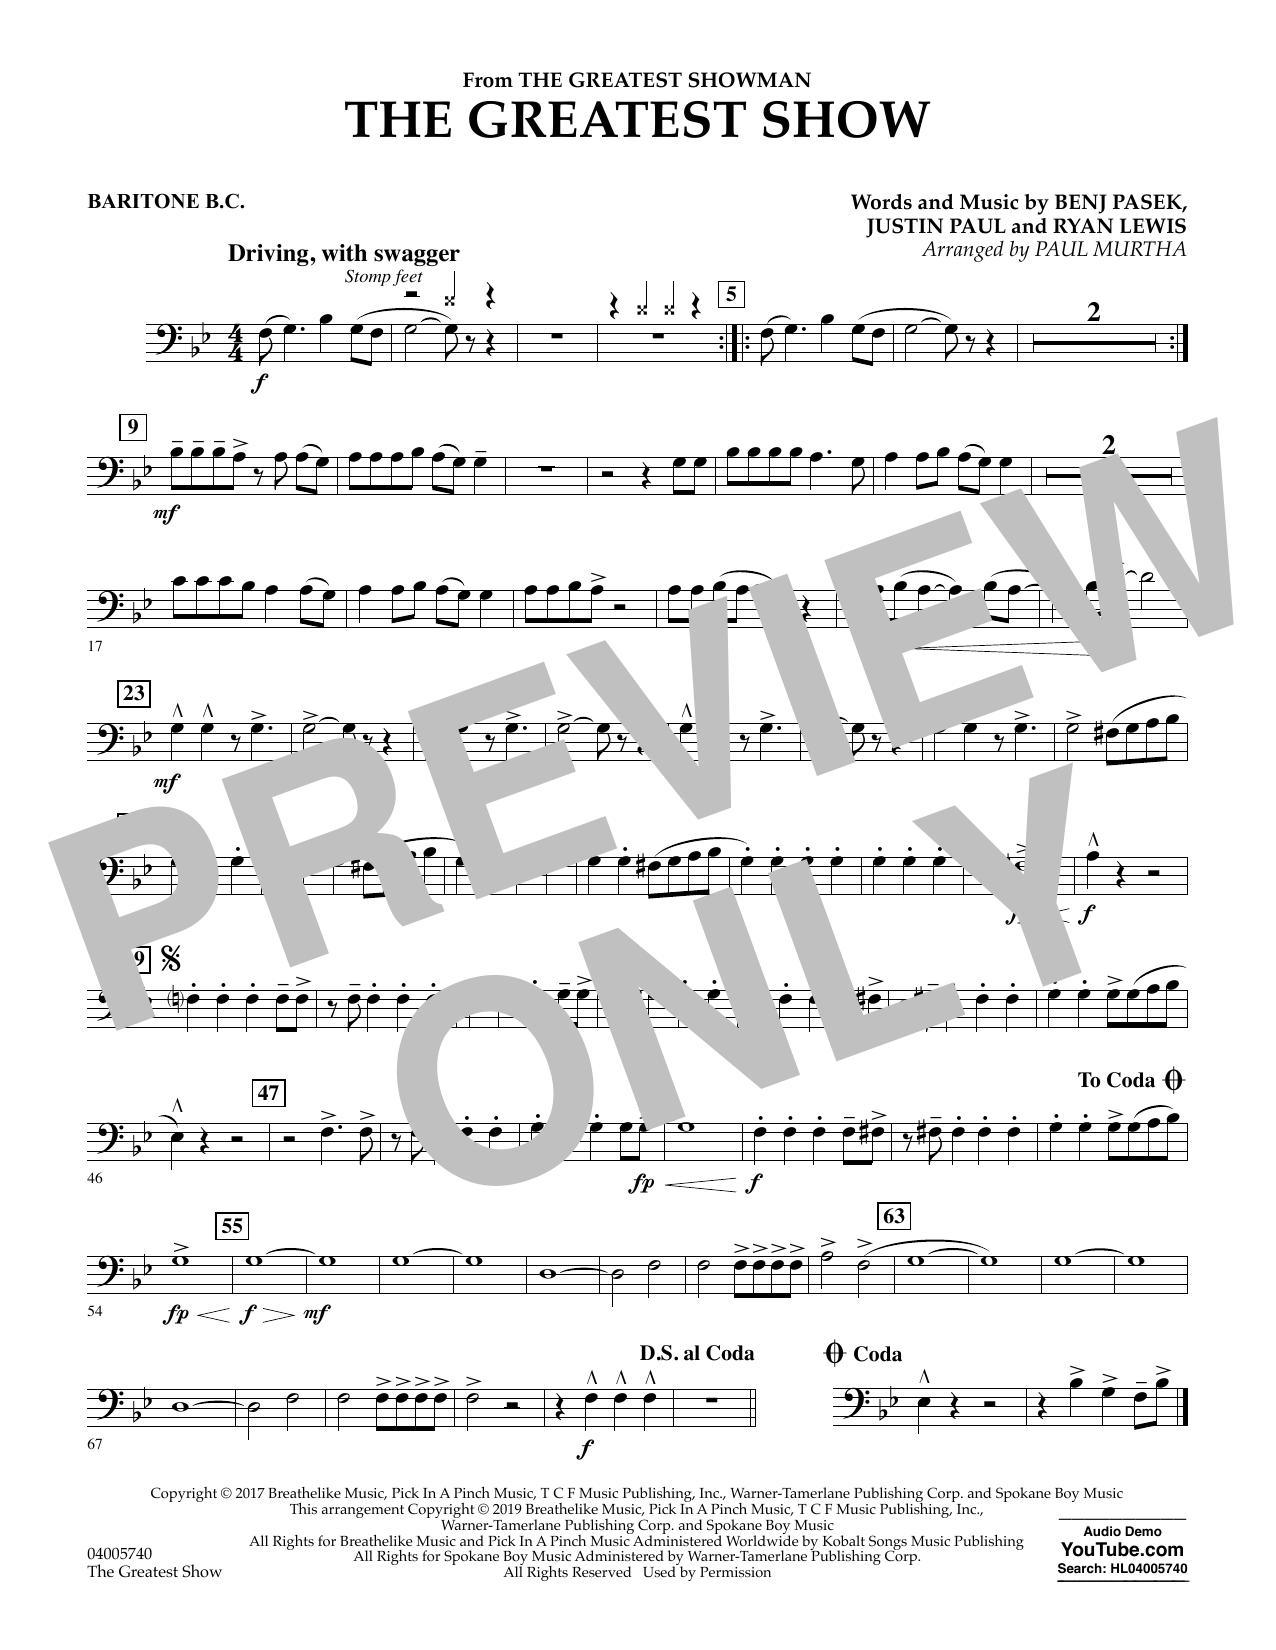 The Greatest Show  (arr. Paul Murtha) - Baritone B.C. (Concert Band)